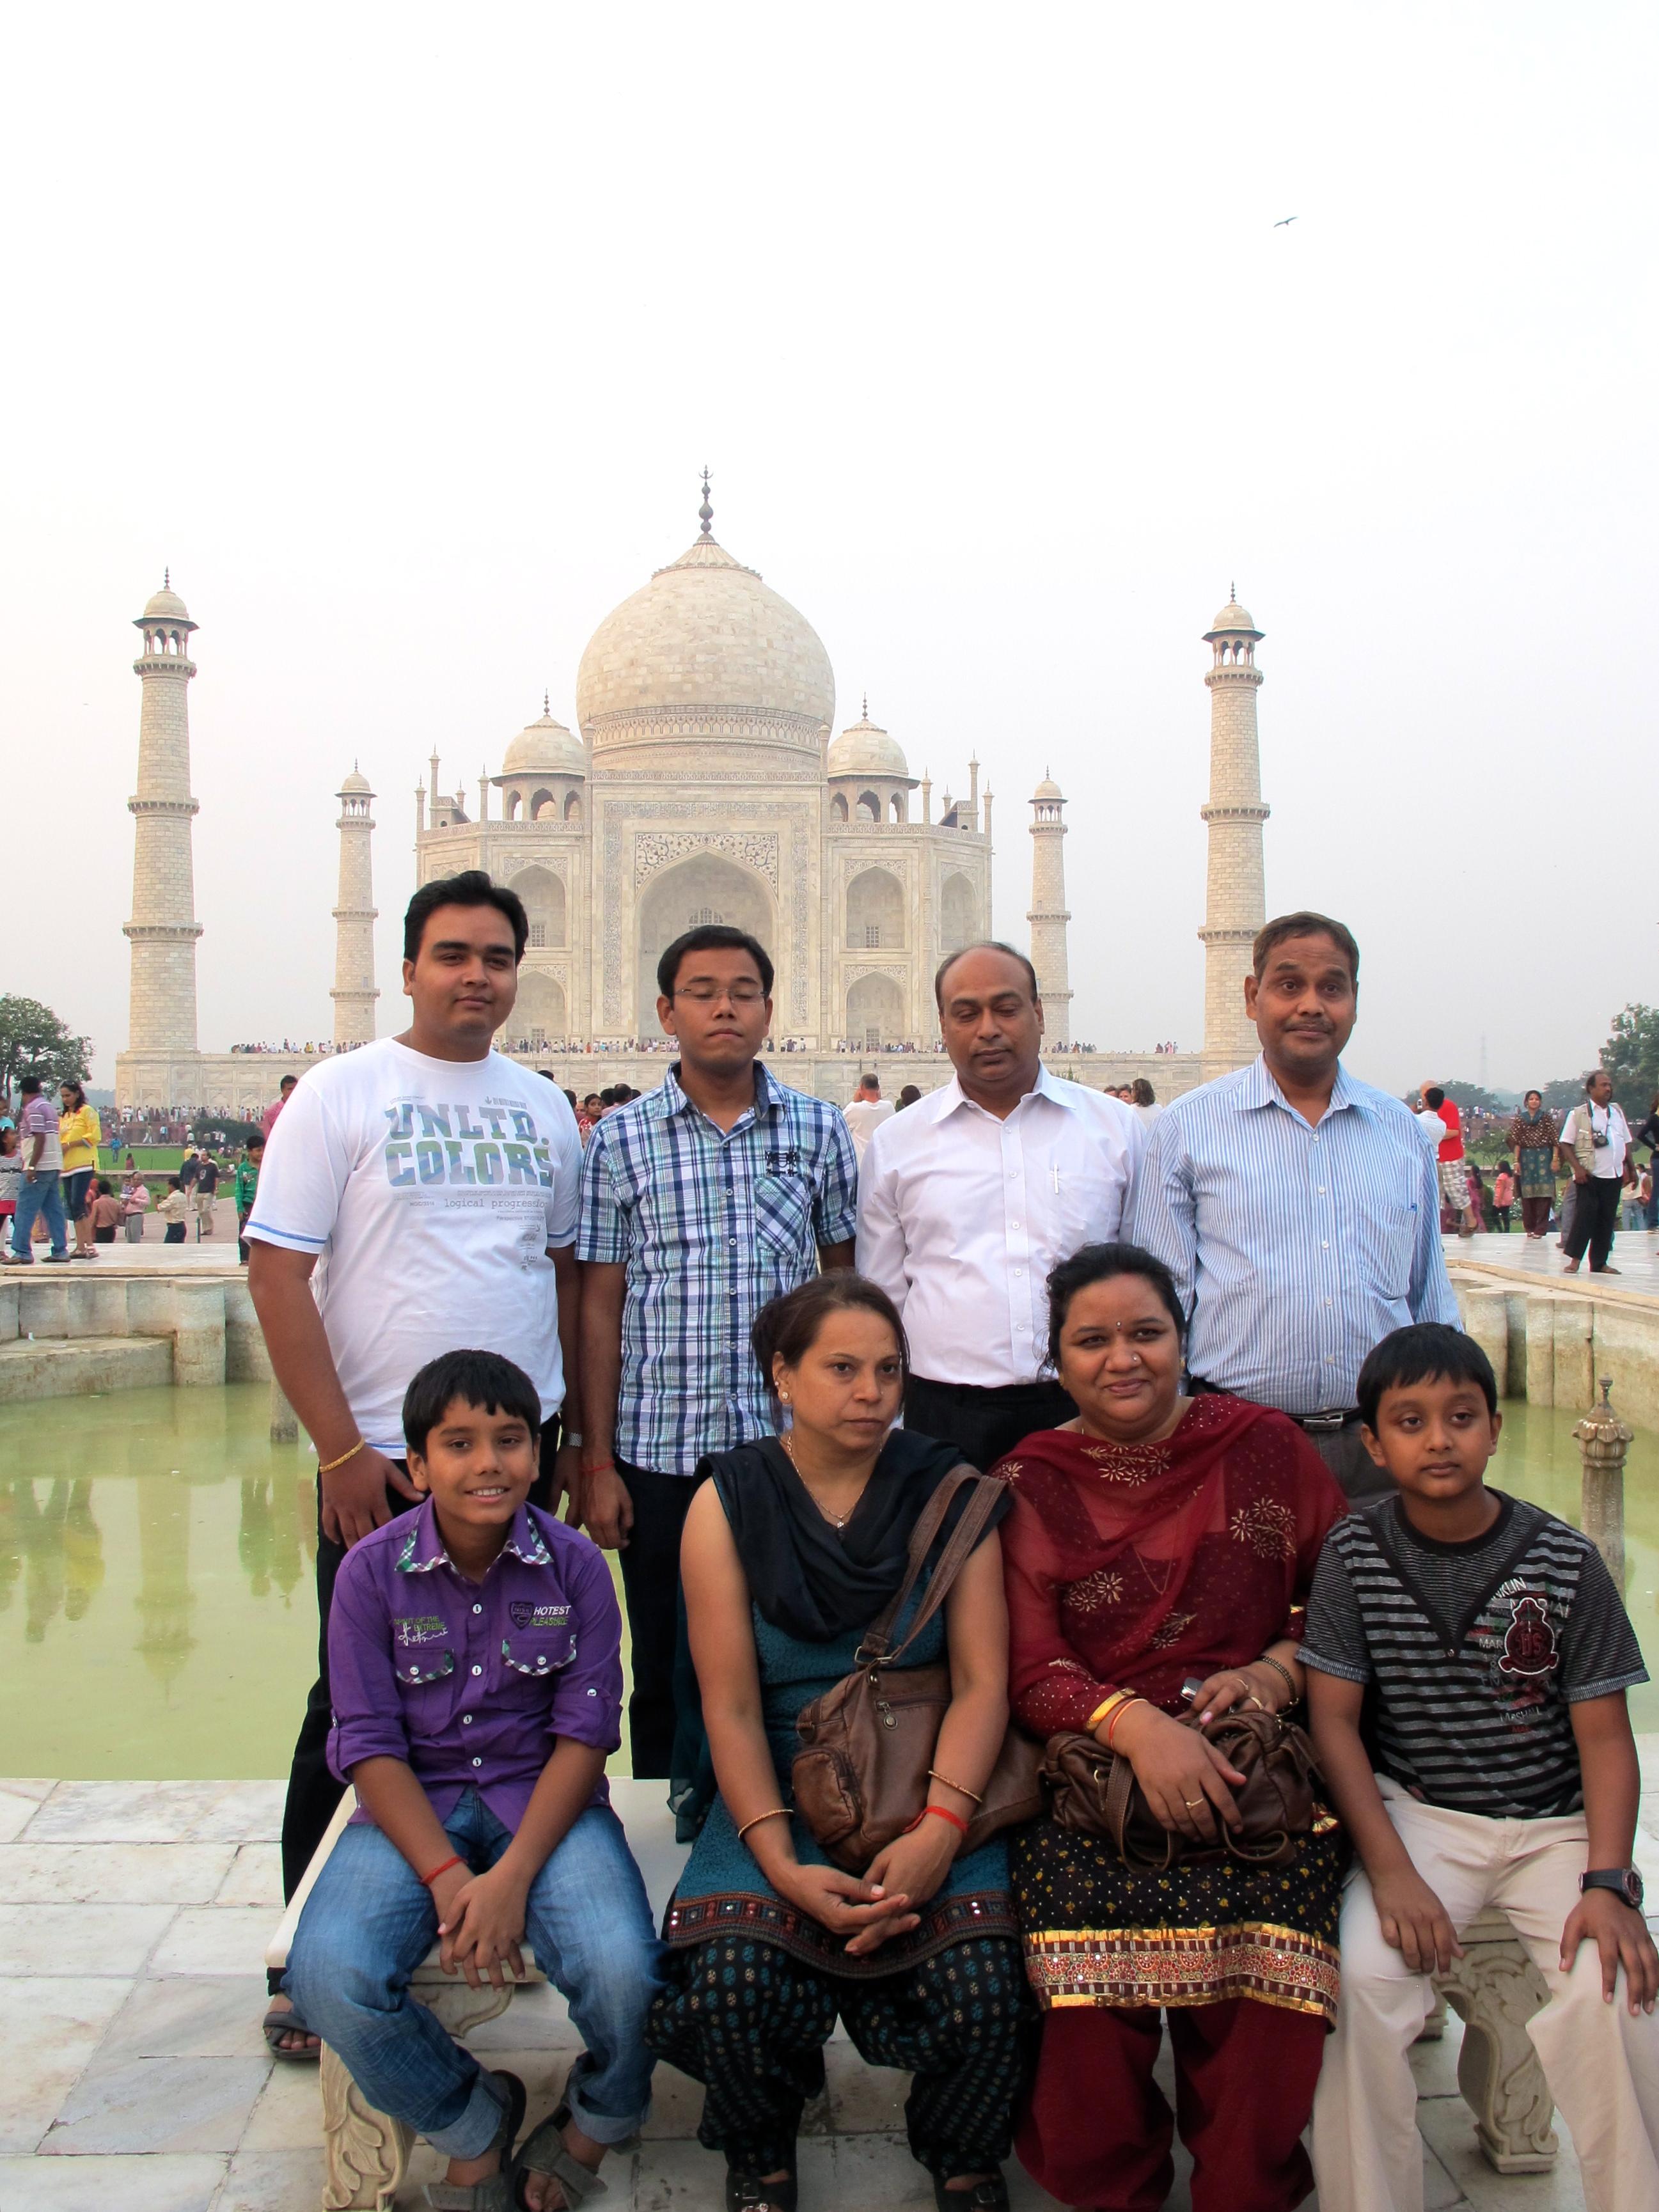 Tourists - Taj Mahal - Agra - India